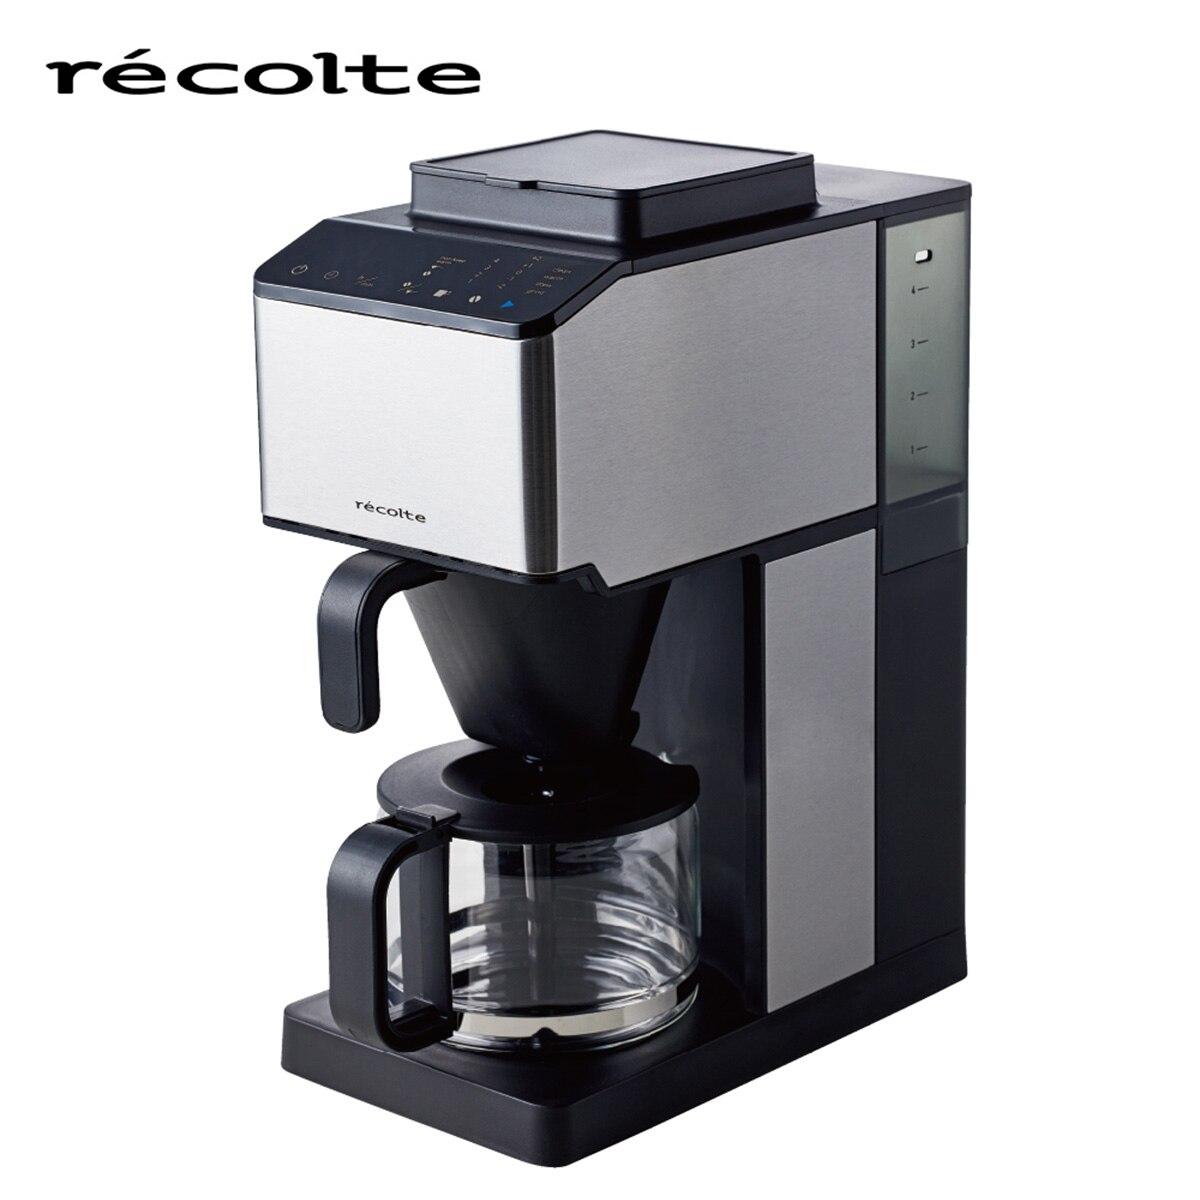 recolte(レコルト) コーン式全自動コーヒーメーカー シルバー RCD-1-S